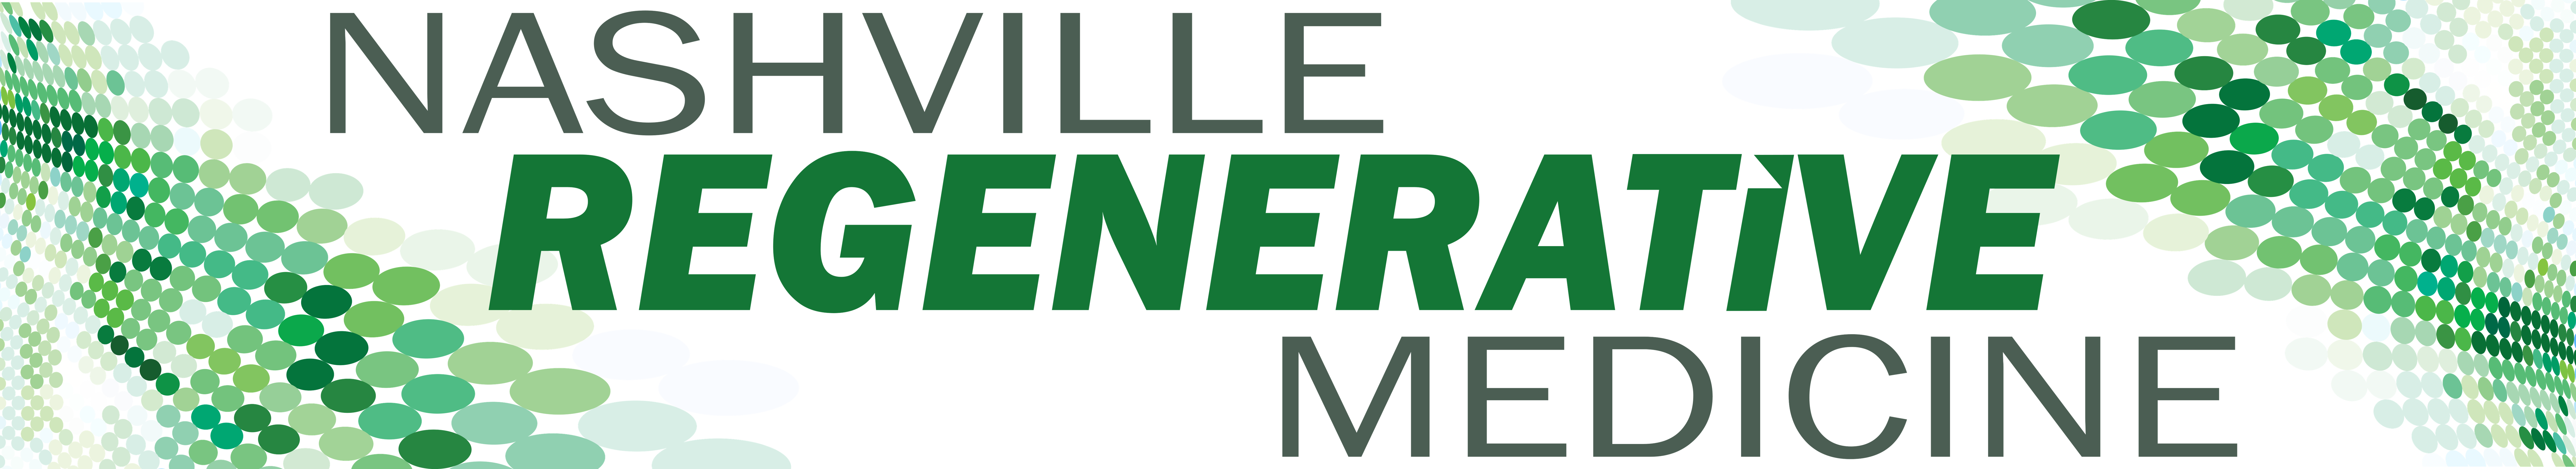 Nashville Regenerative Medicine Logo